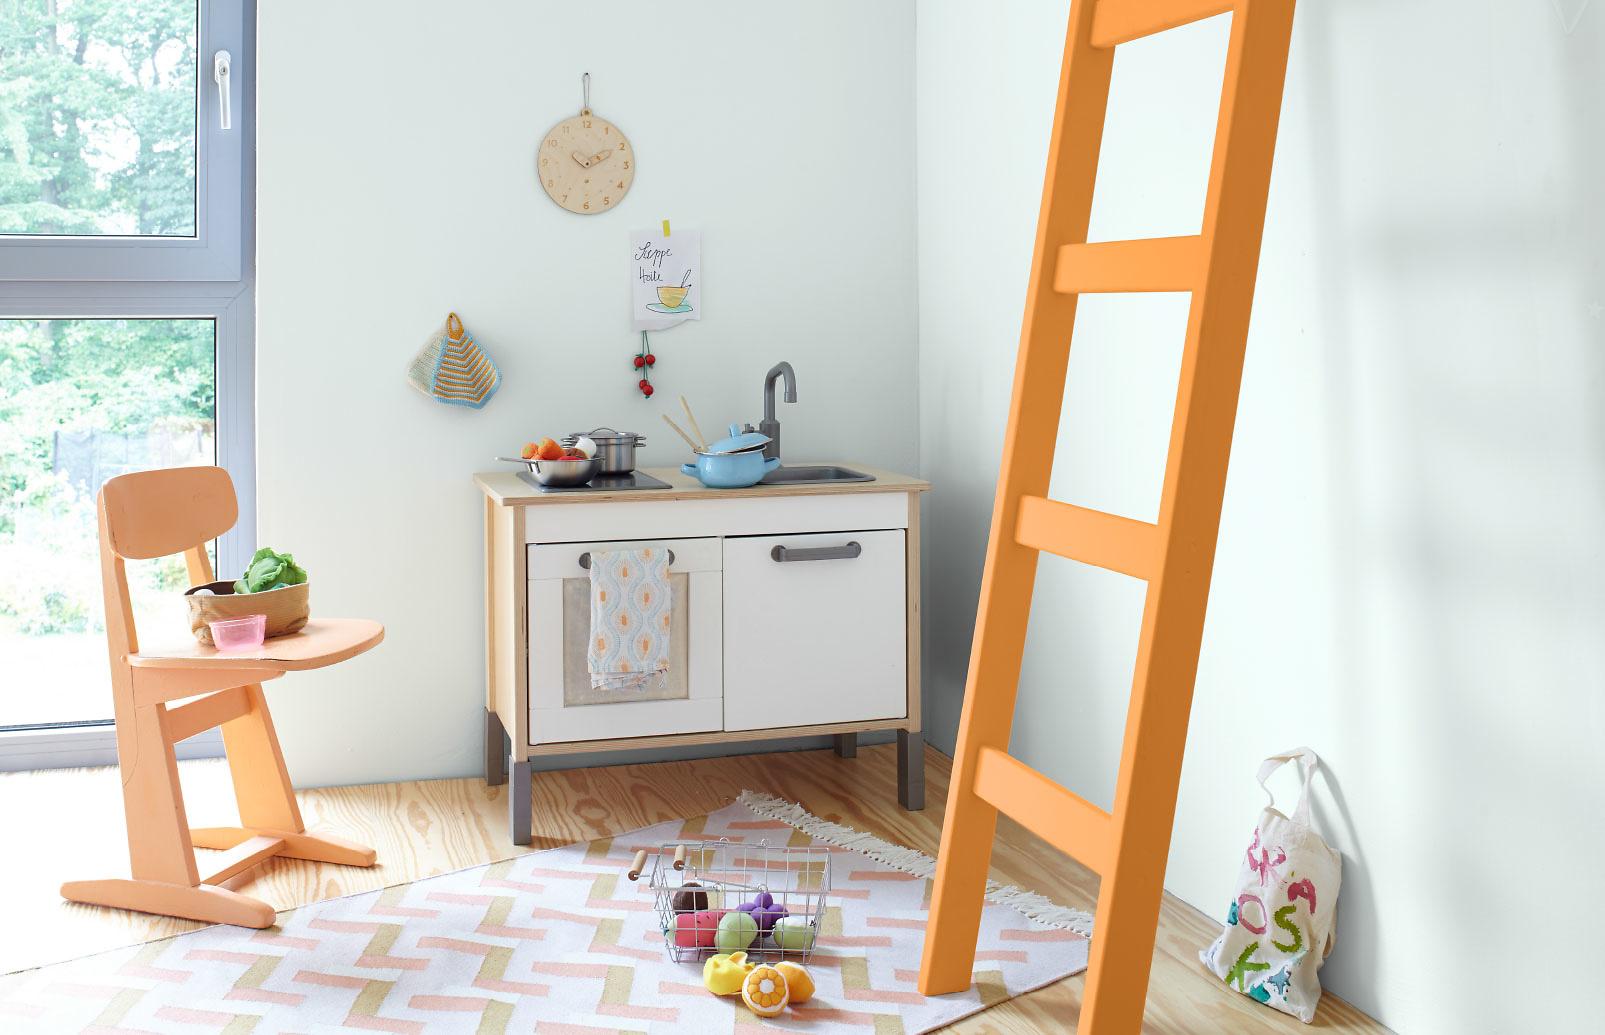 blau blaue farbe blaue wandfarbe alpina farben. Black Bedroom Furniture Sets. Home Design Ideas